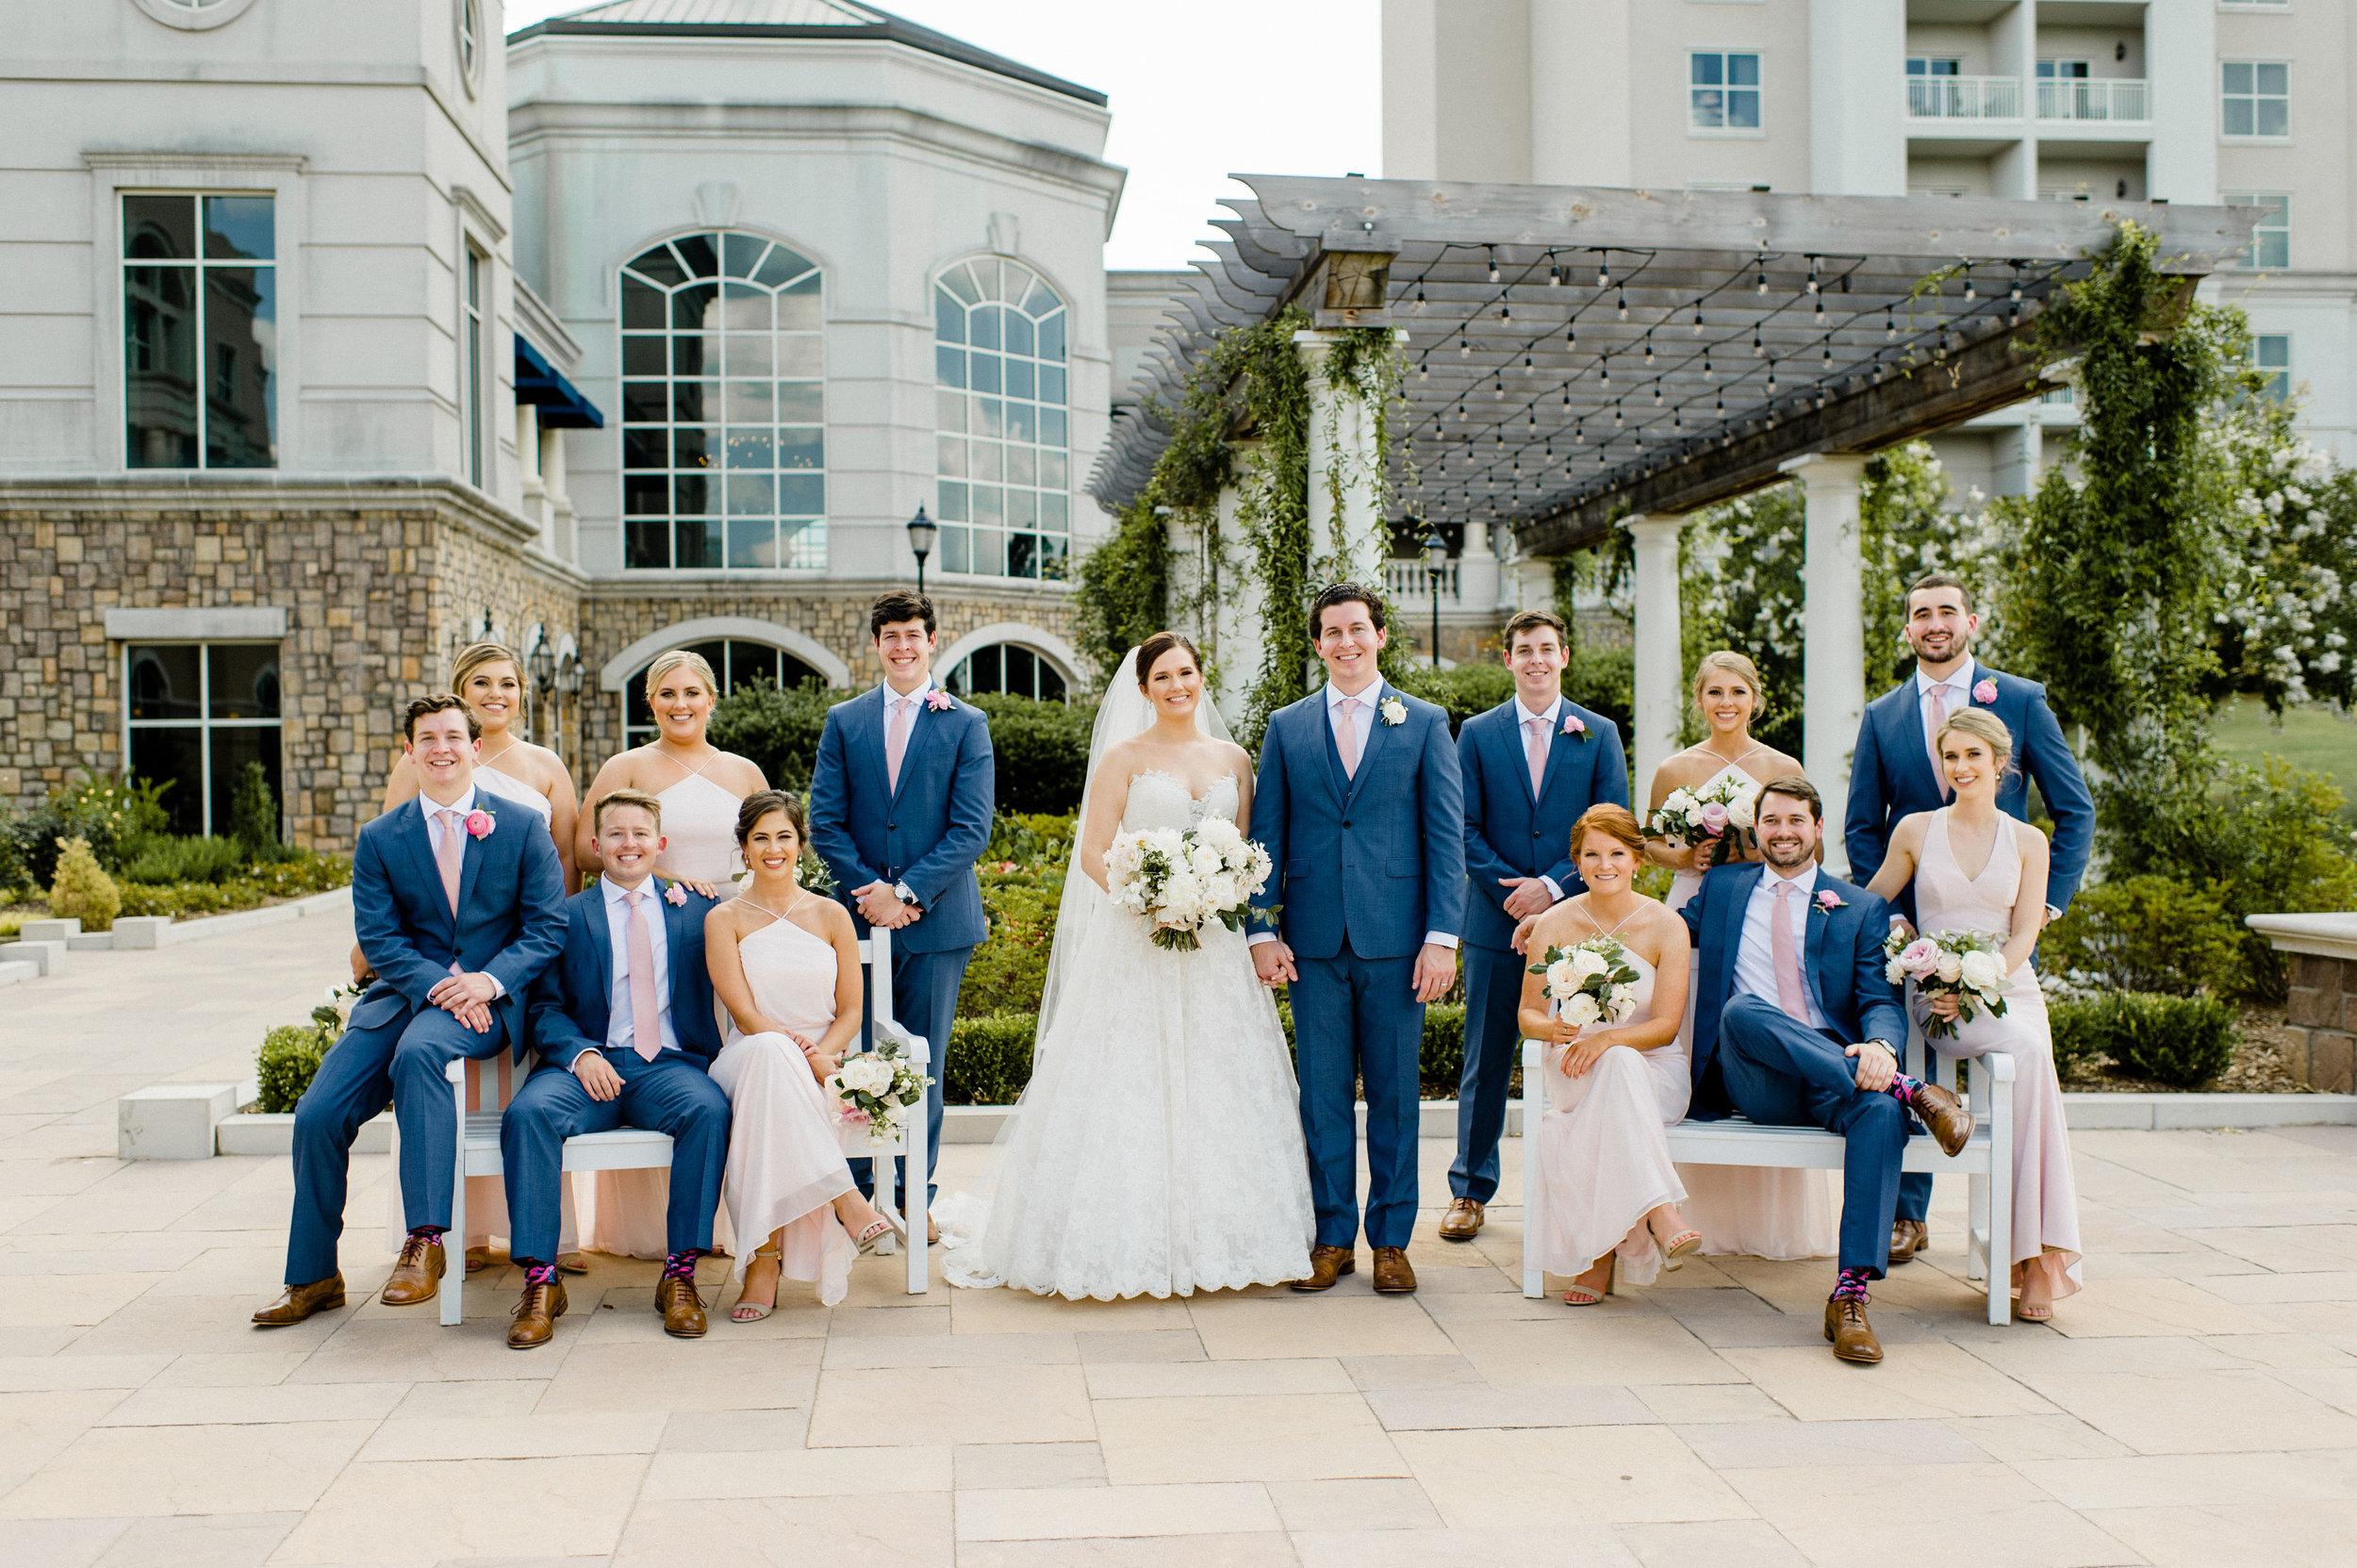 McElravey_Wedding_CarolineLimaPhotography_2018_188.jpg